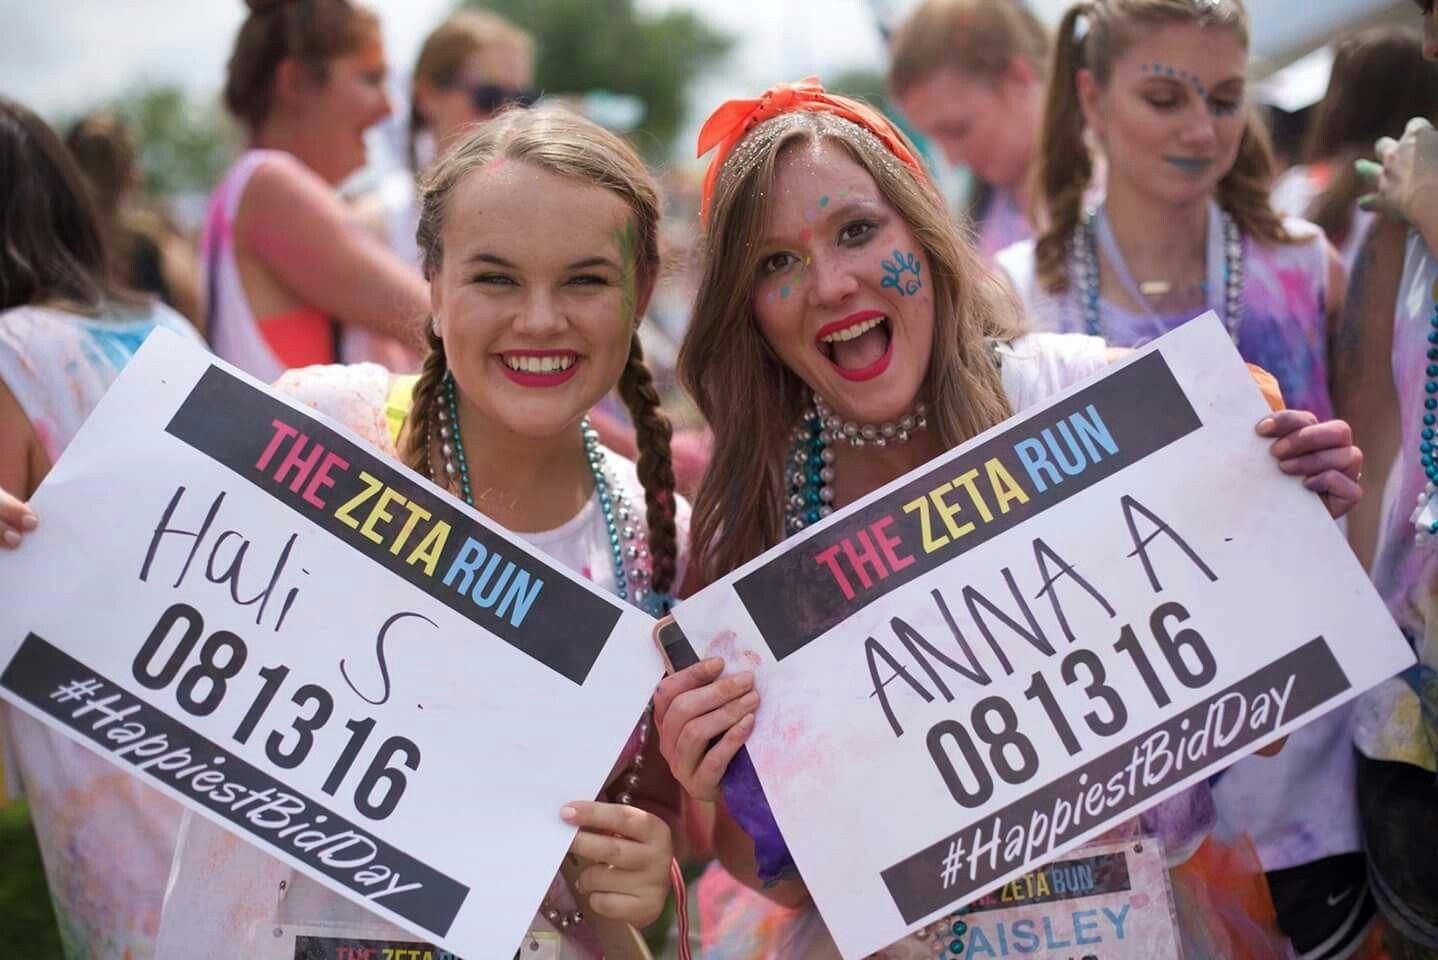 Happiest Bid Day On Earth Color Run Themed Zeta Tau Alpha Mississippi State University Bid Day Bid Day Themes Sorority Bid Day